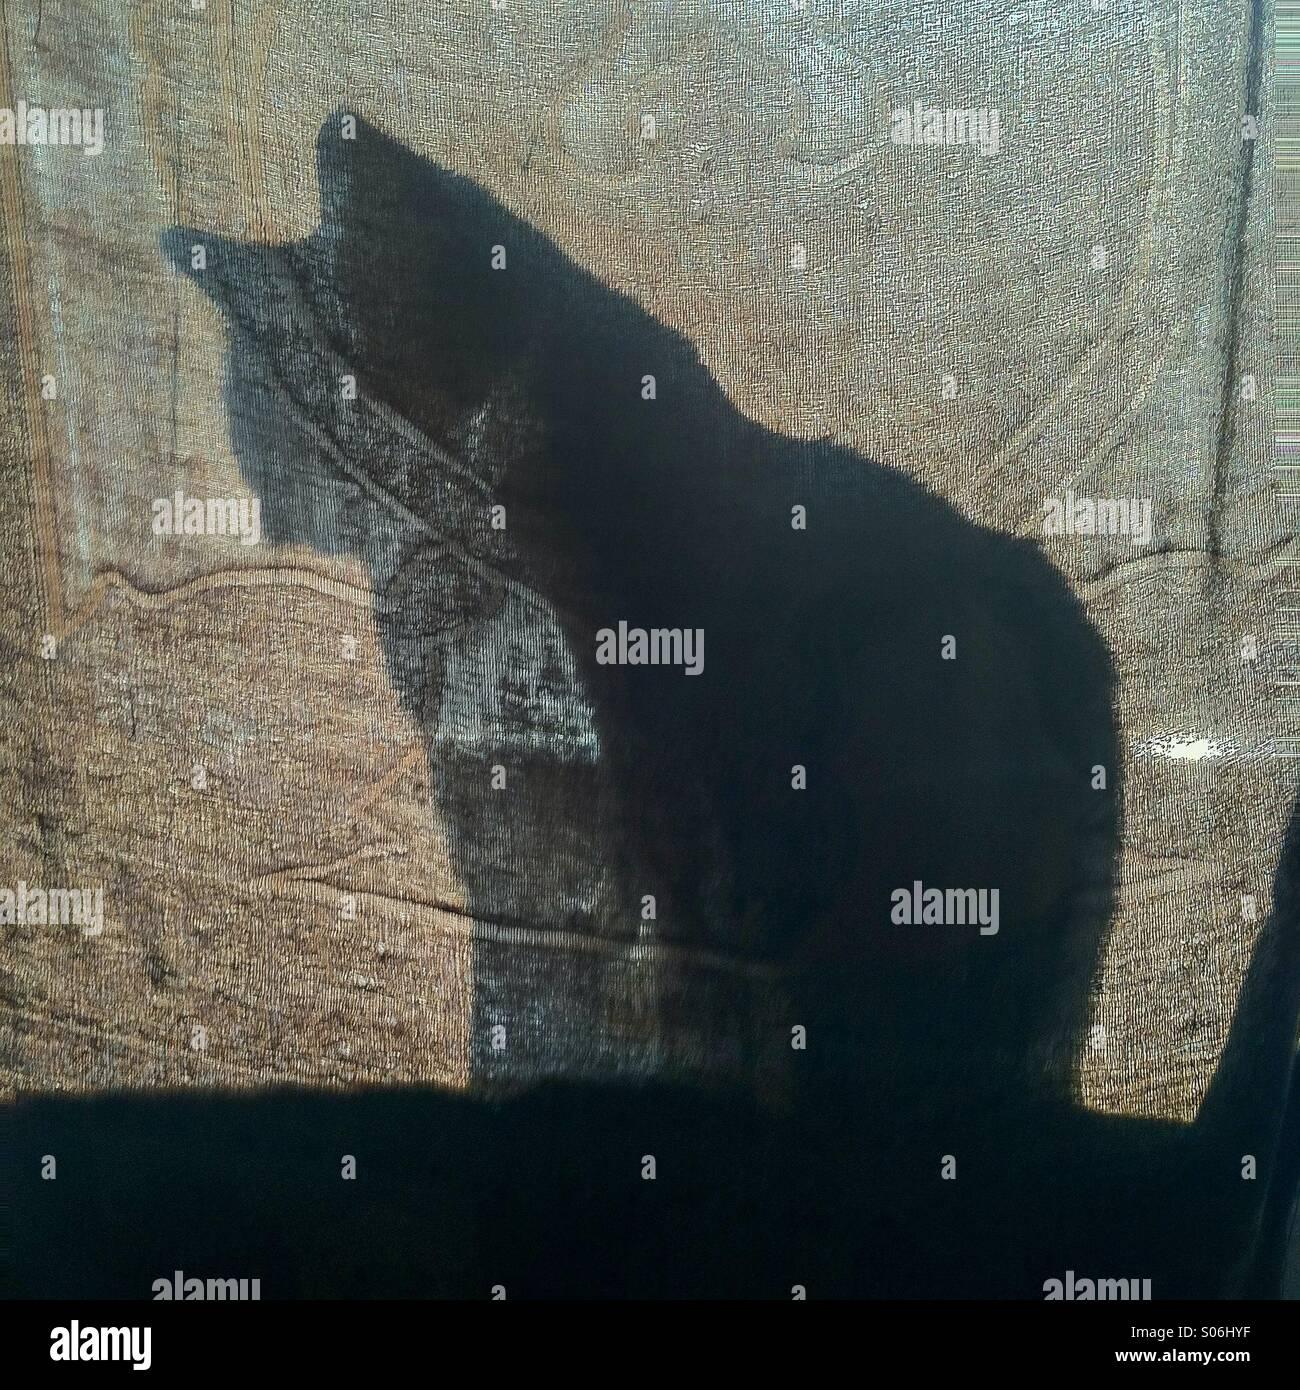 Cat silhouette through fabric - Stock Image